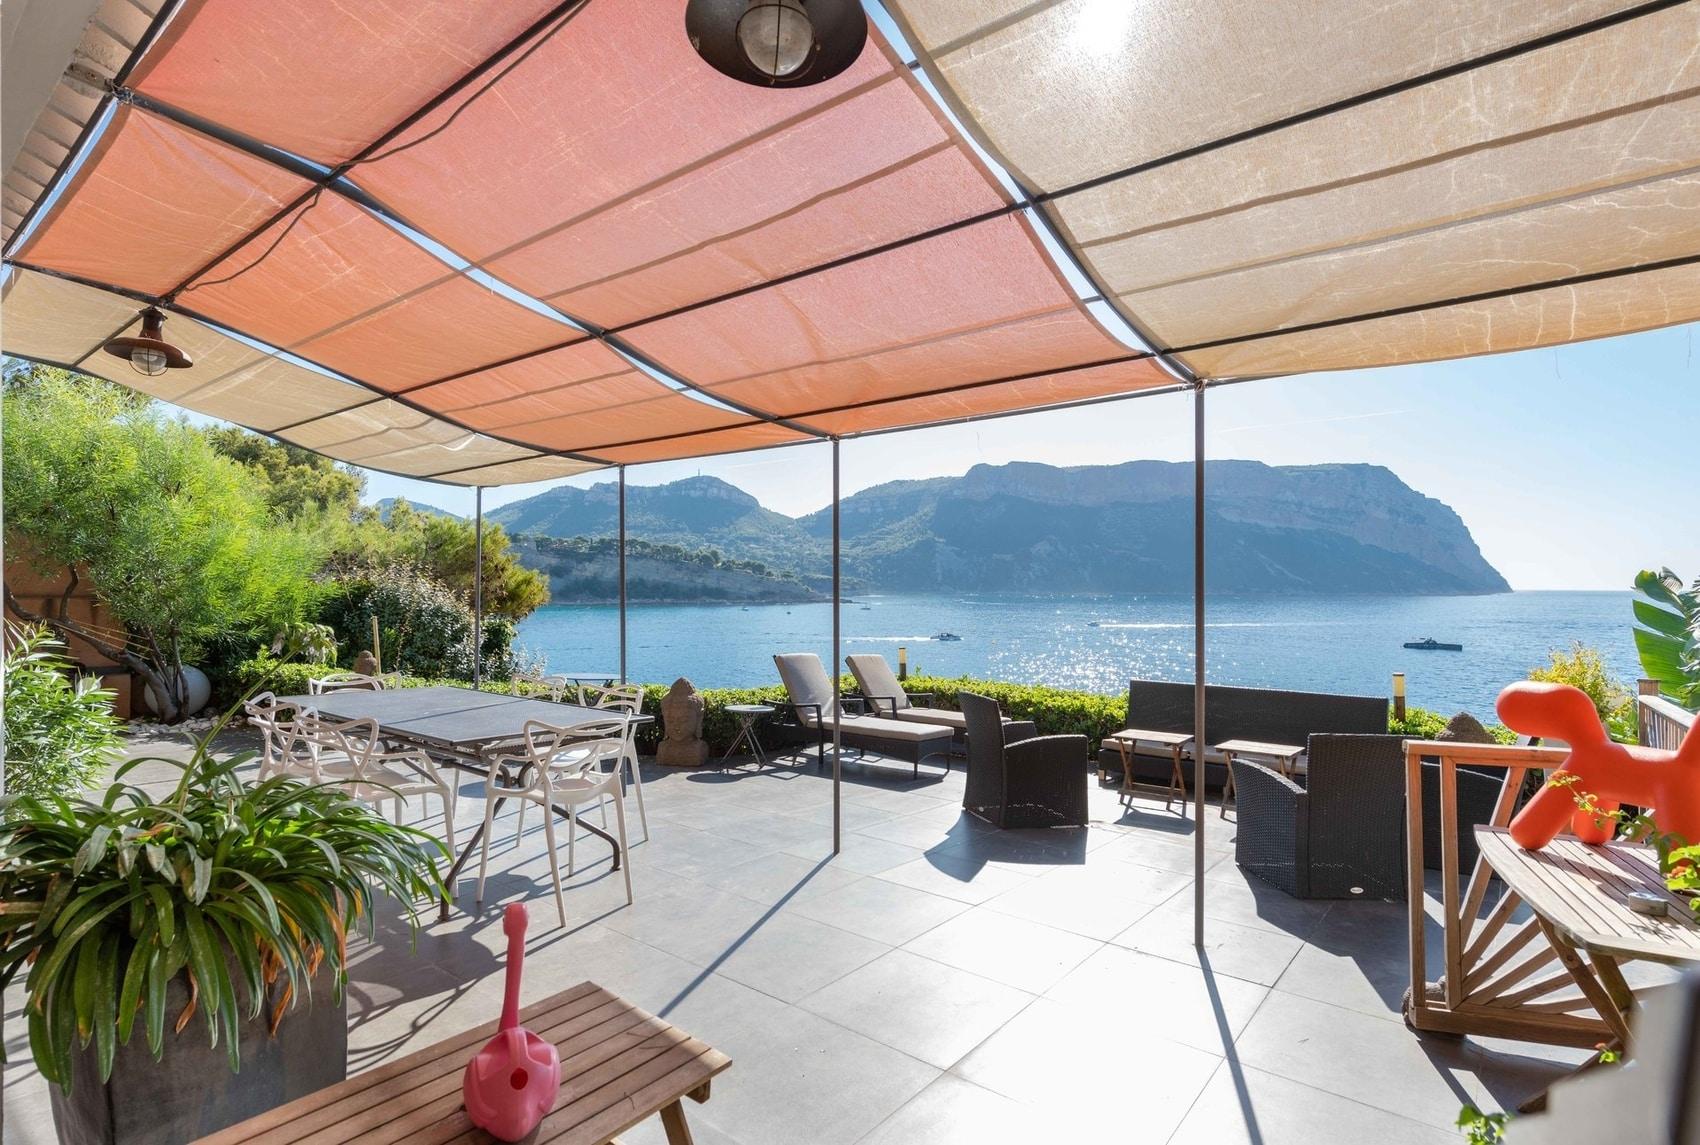 villa-a-vendre-cassis-terrasses-piscine-balcon-mer-vue-cap-canaille